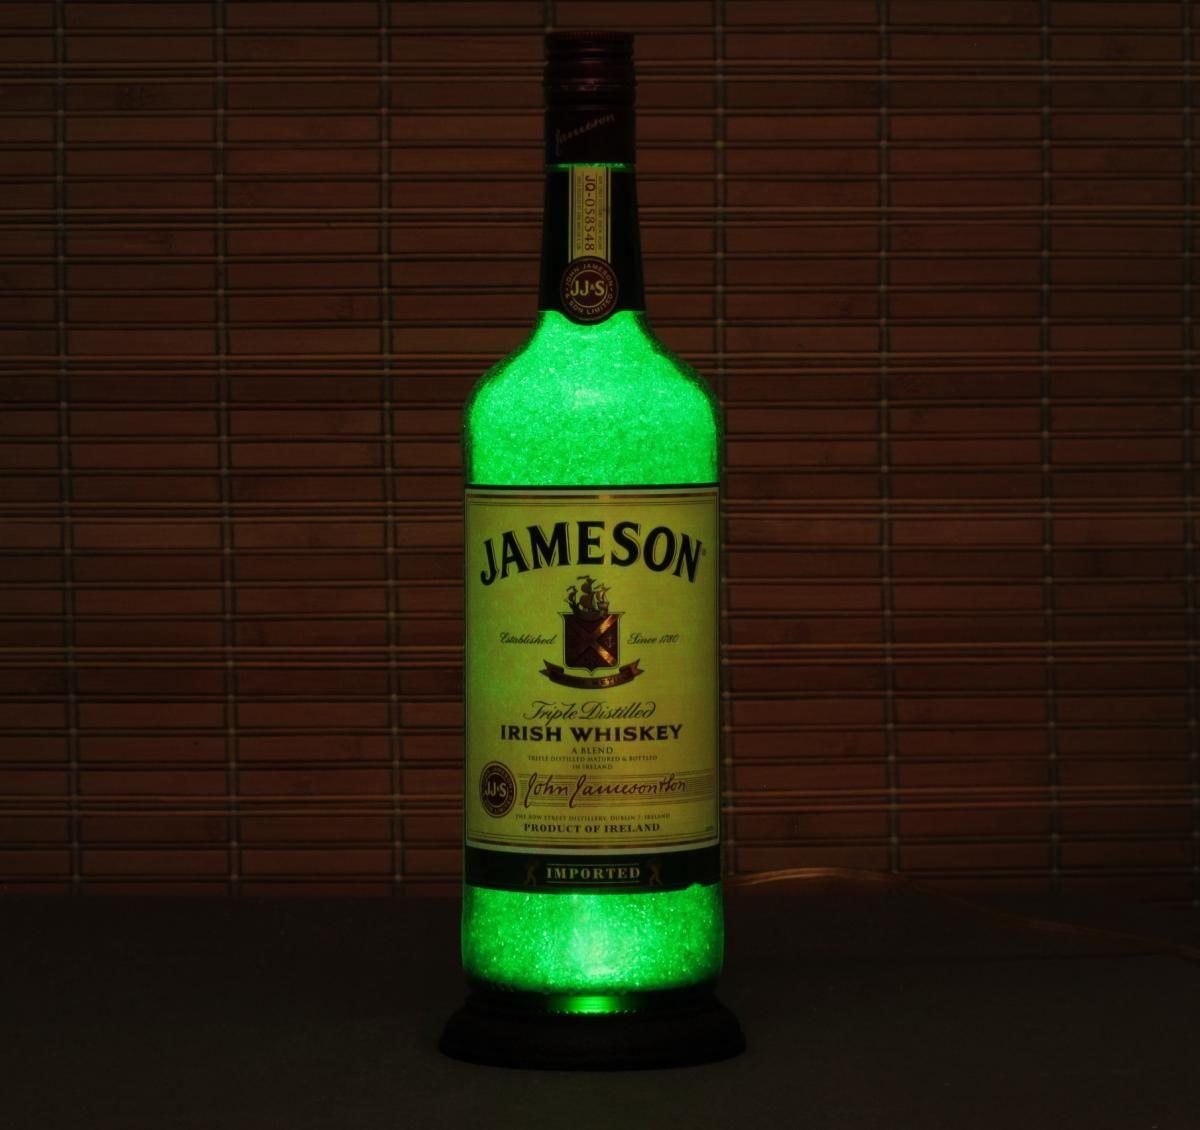 Jamesons Irish Whiskey 70cl Empty Gin Bottle Lamp Light